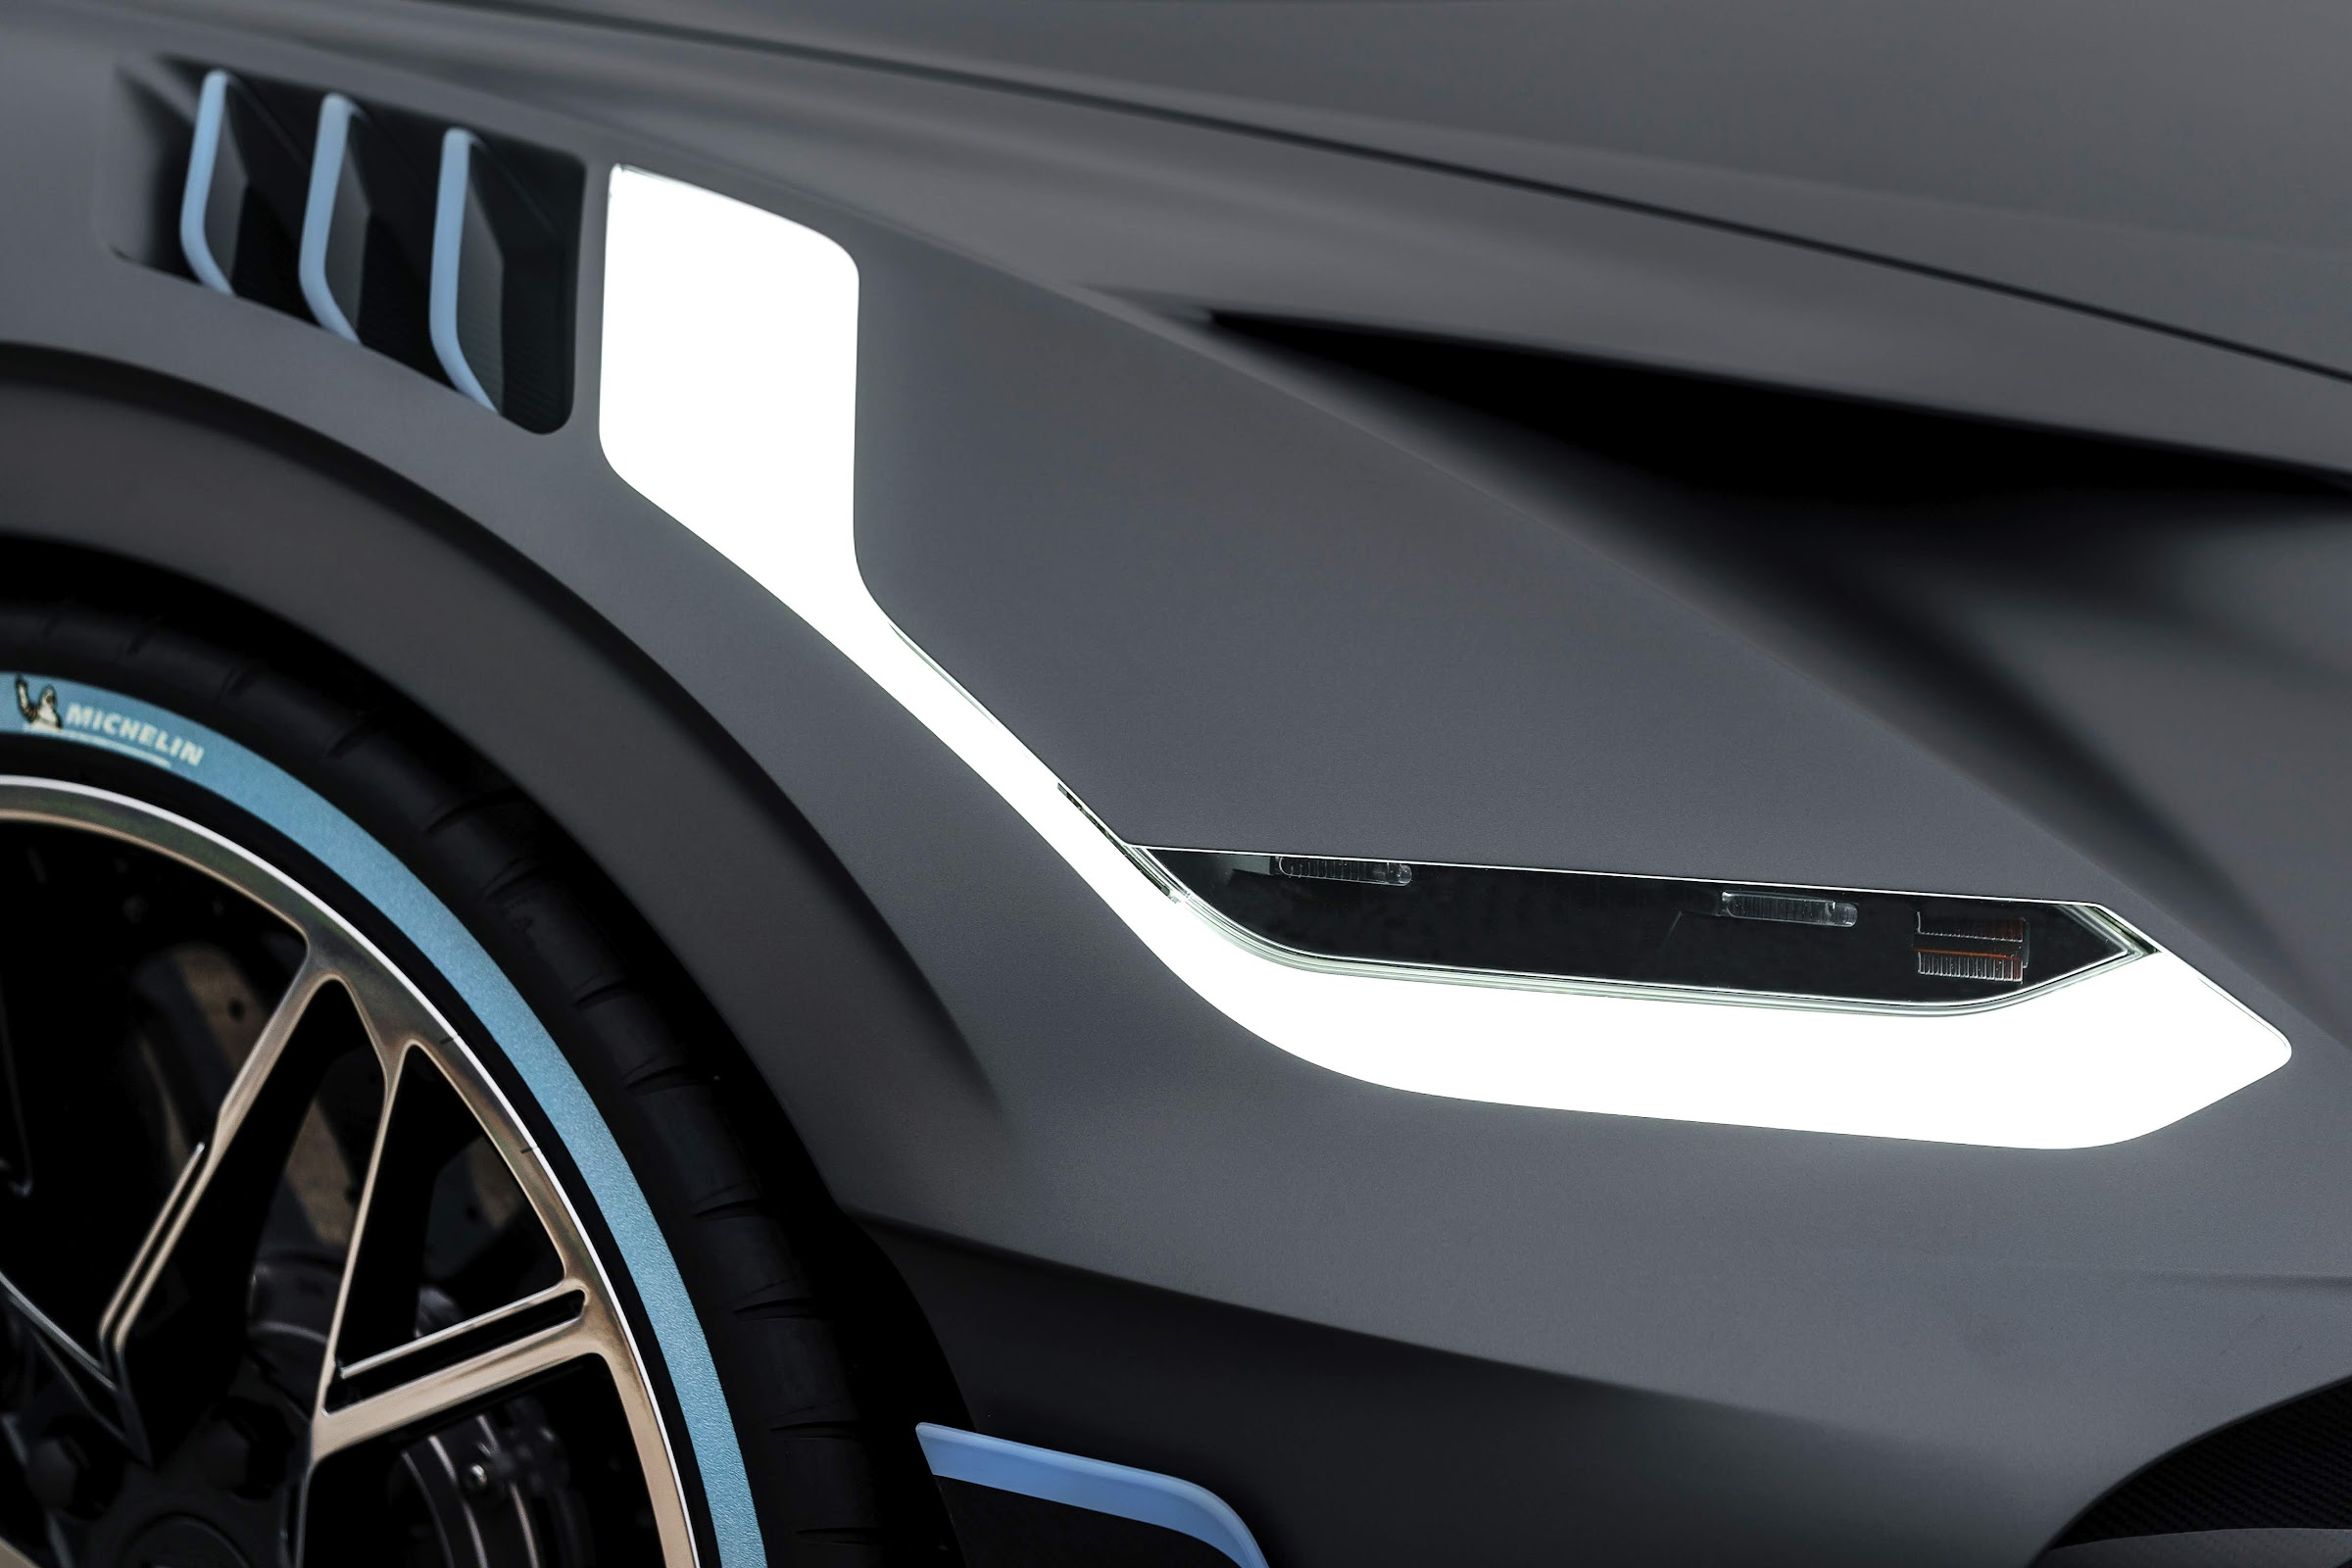 AL3SDmeqmKYSpNM6jEECfCltMyvVnWeMNvwF7ybGsqkh7HZNRWWYfkGhNJQ1UGguQ2JPqsB3I1iQAq7H76rmmiHb2tlQsqqo1KqW97c9HEpJyvZVBy0uj9p suuJ9BVmwGy nUl3gw=w2400 - Nueva galería de fotos del nuevo Bugatti Divo (+presentación)